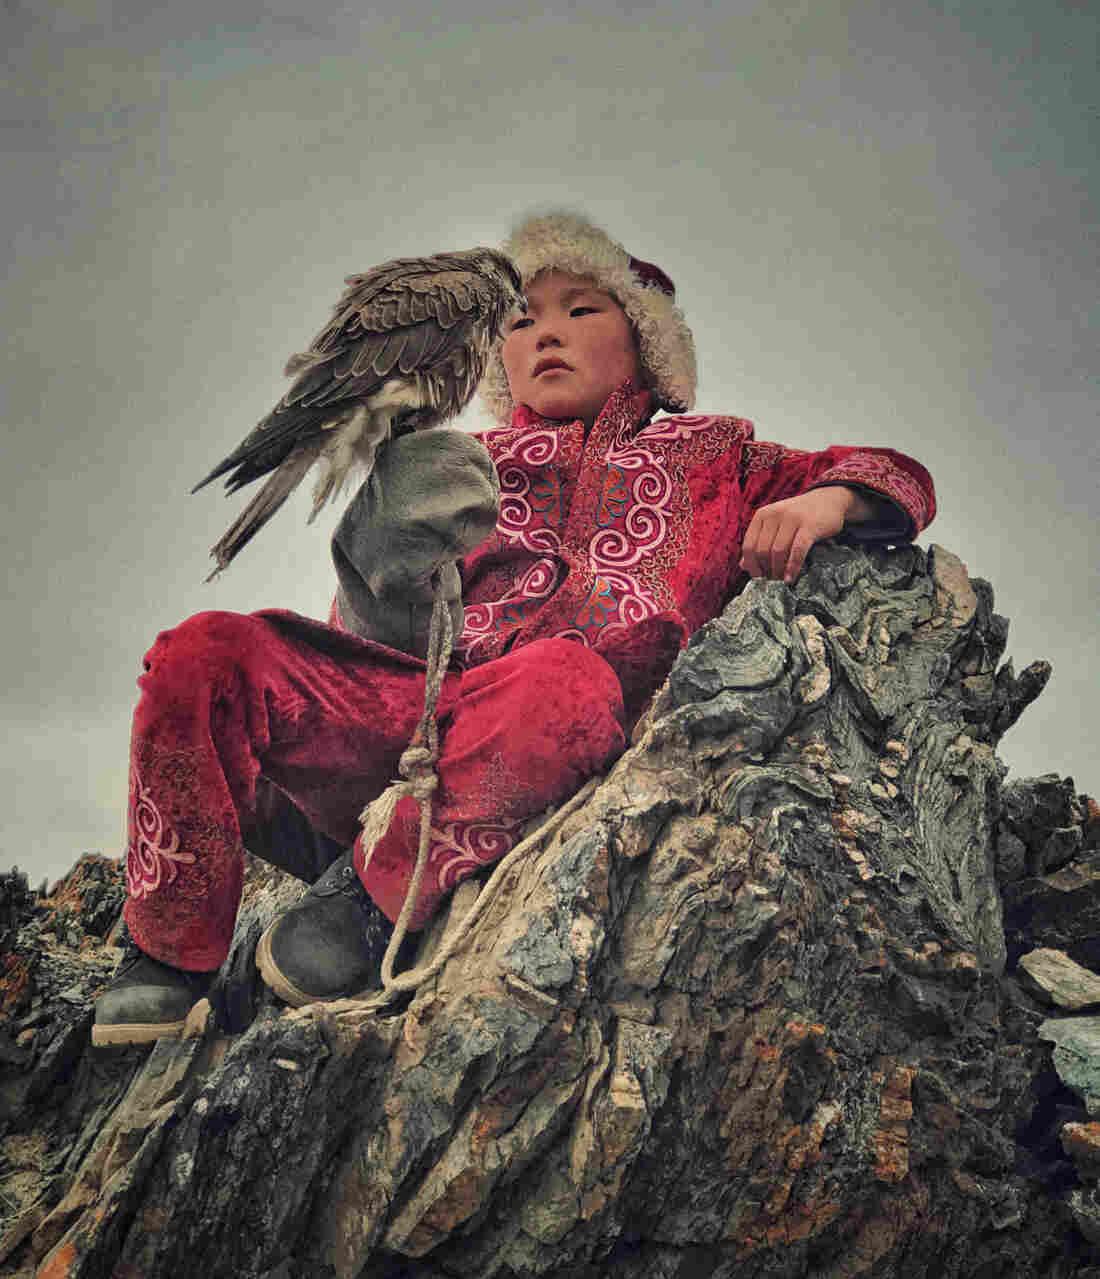 A boy with his hunting bird in Bayan Ulgi province, Mongolia.